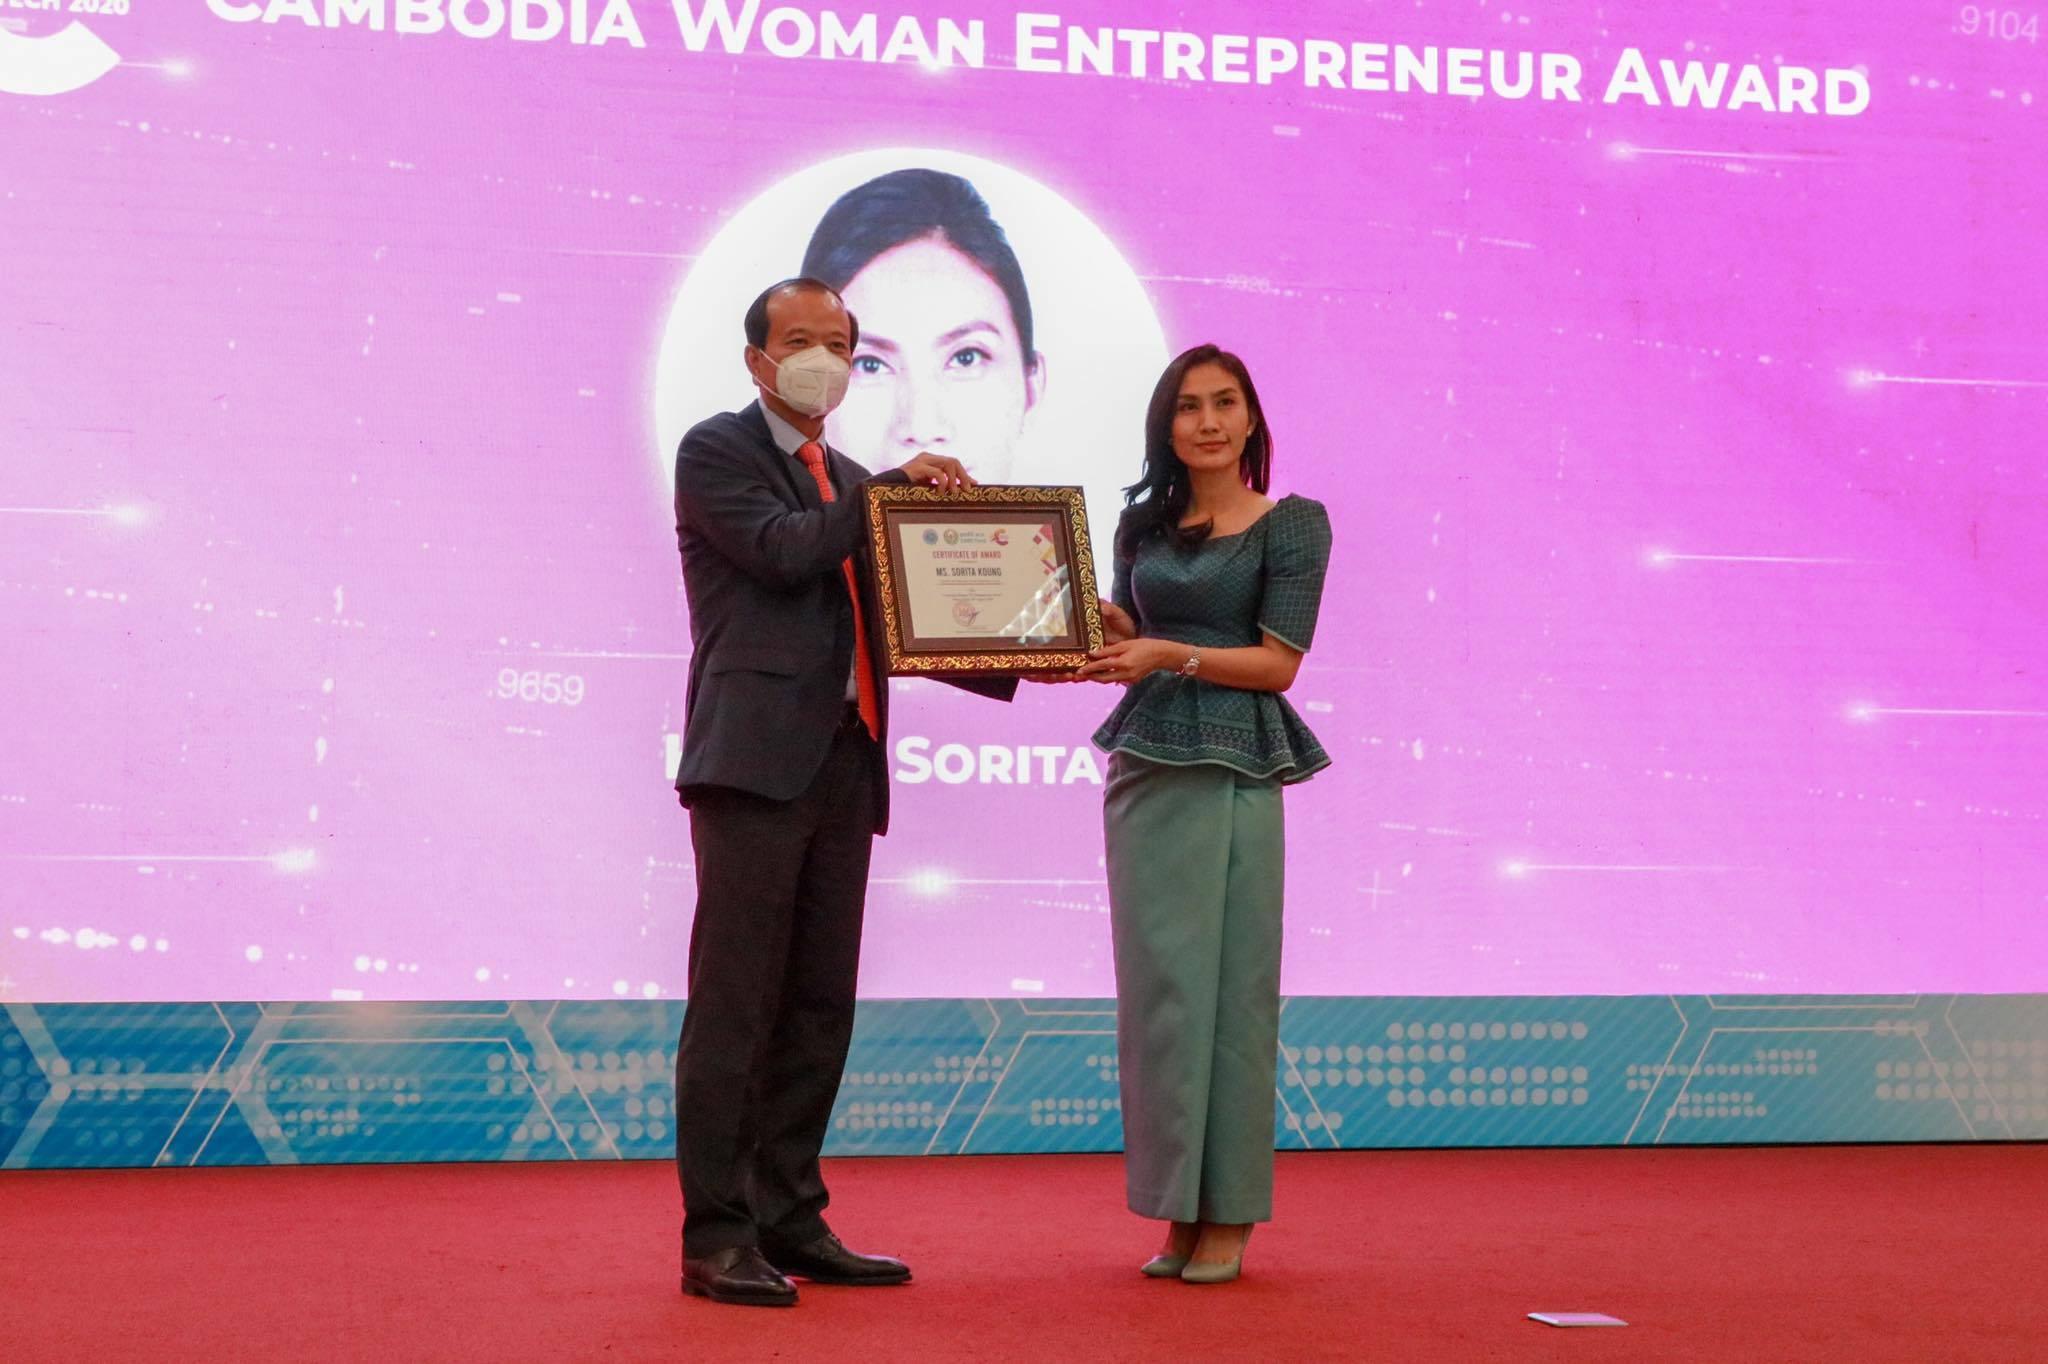 The Cambodian Woman Entrepreneur Award goes to Mrs. Kong Sorita